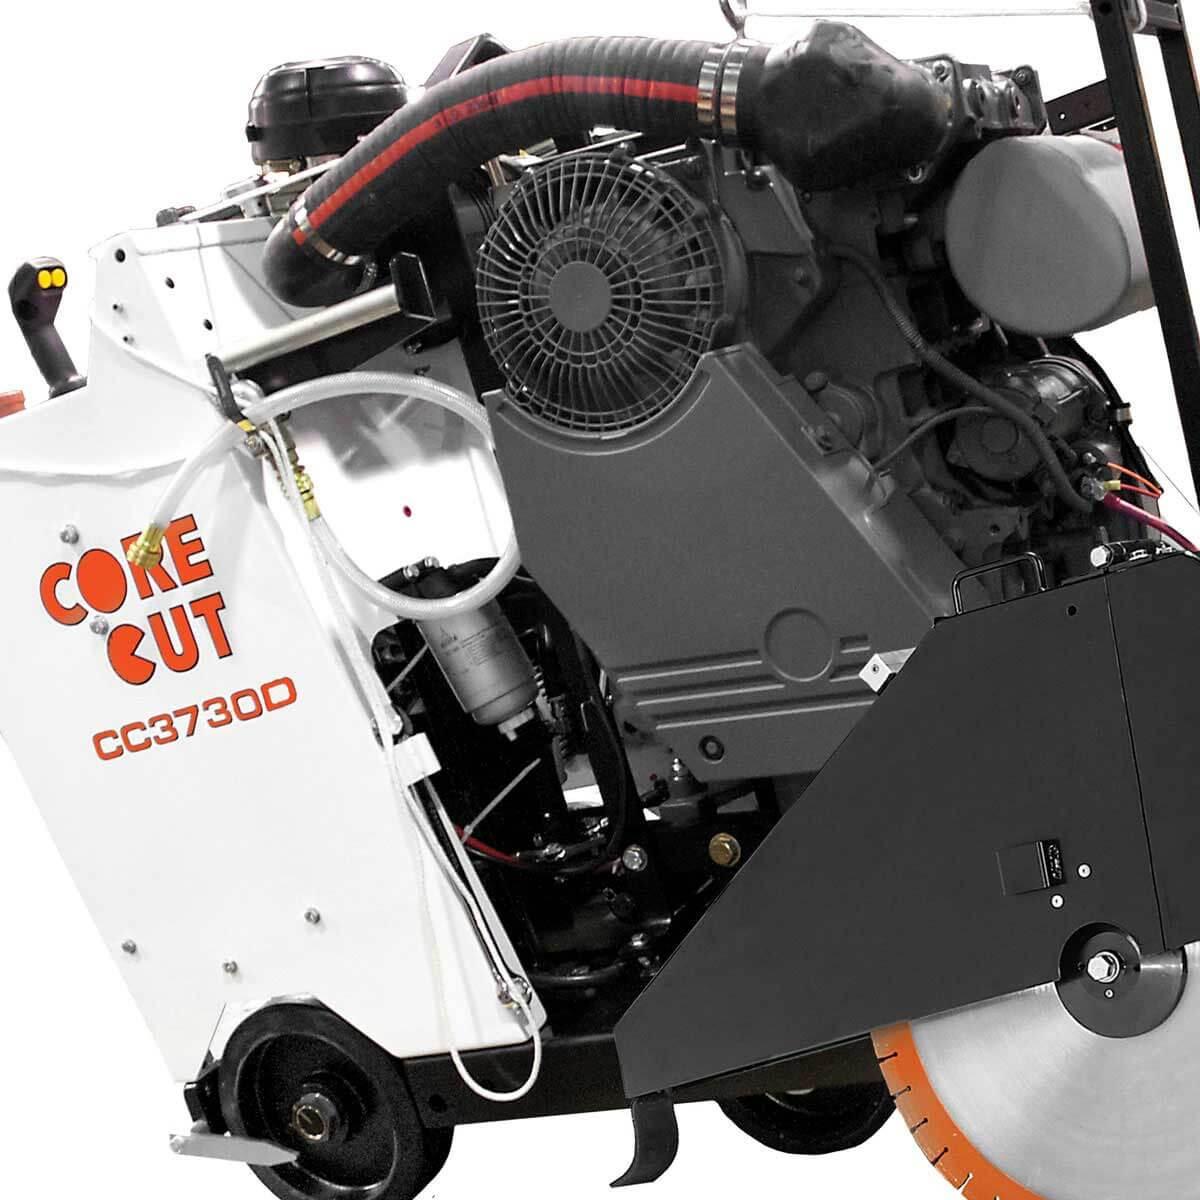 Core Cut CC3700 concrete saw motor